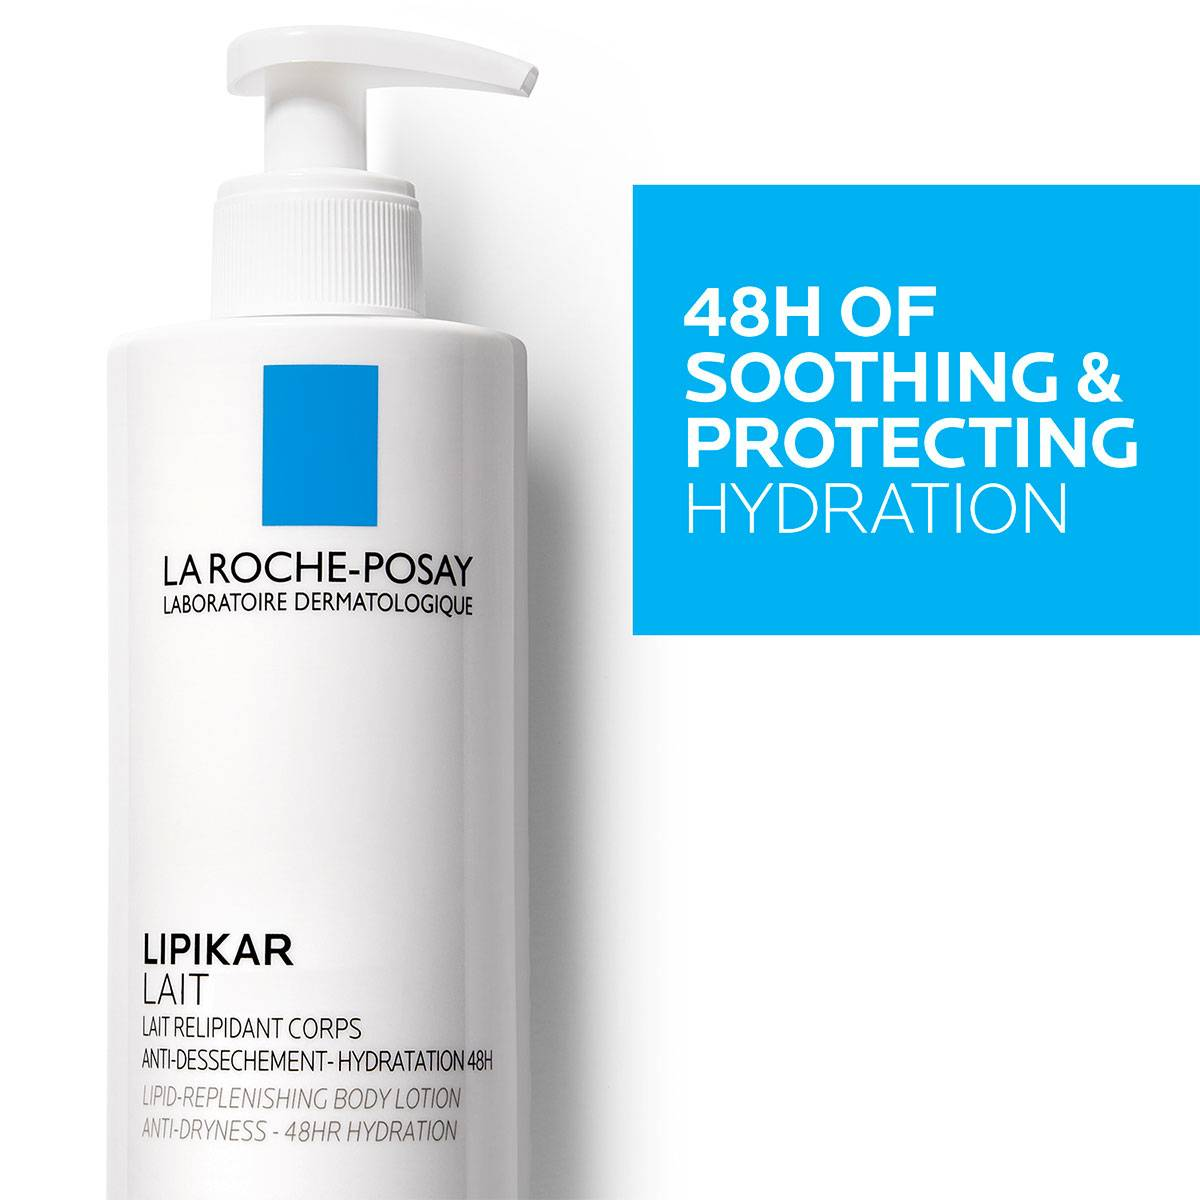 Larocheposay ProduktSide Eksem Lipikar Lait 400ml 3337875552127 Zoome